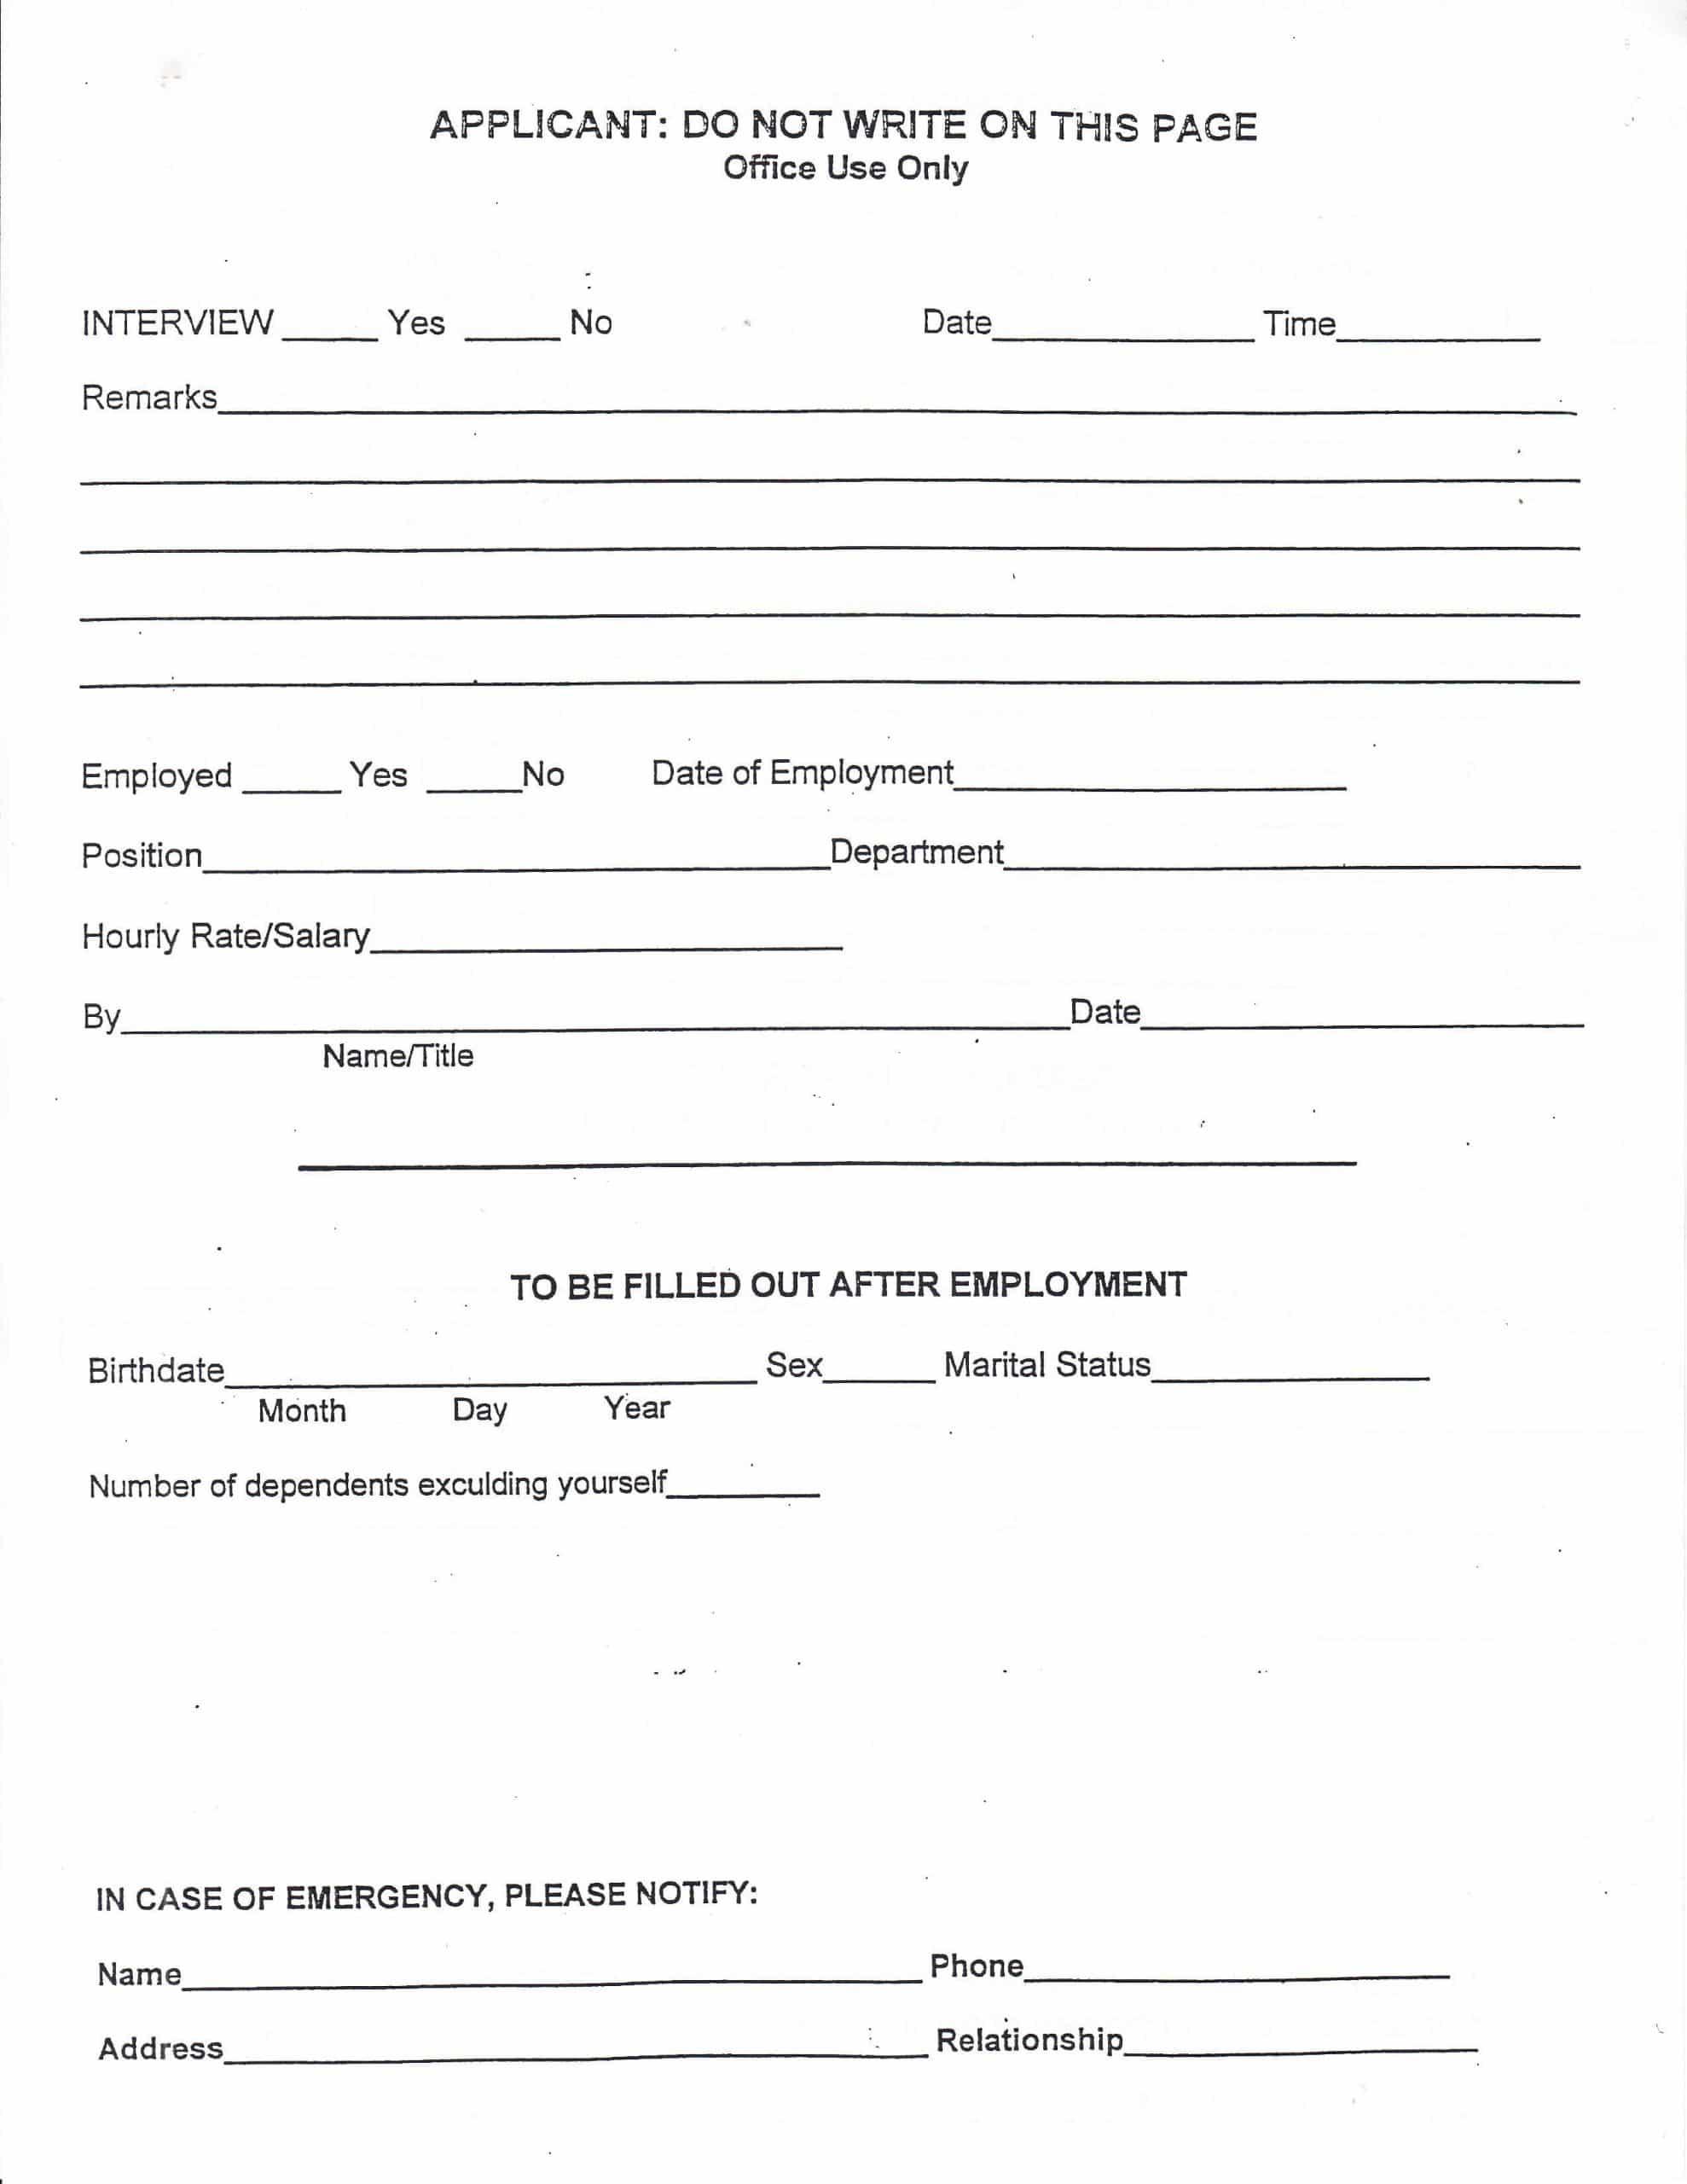 MCPL Application pg. 4